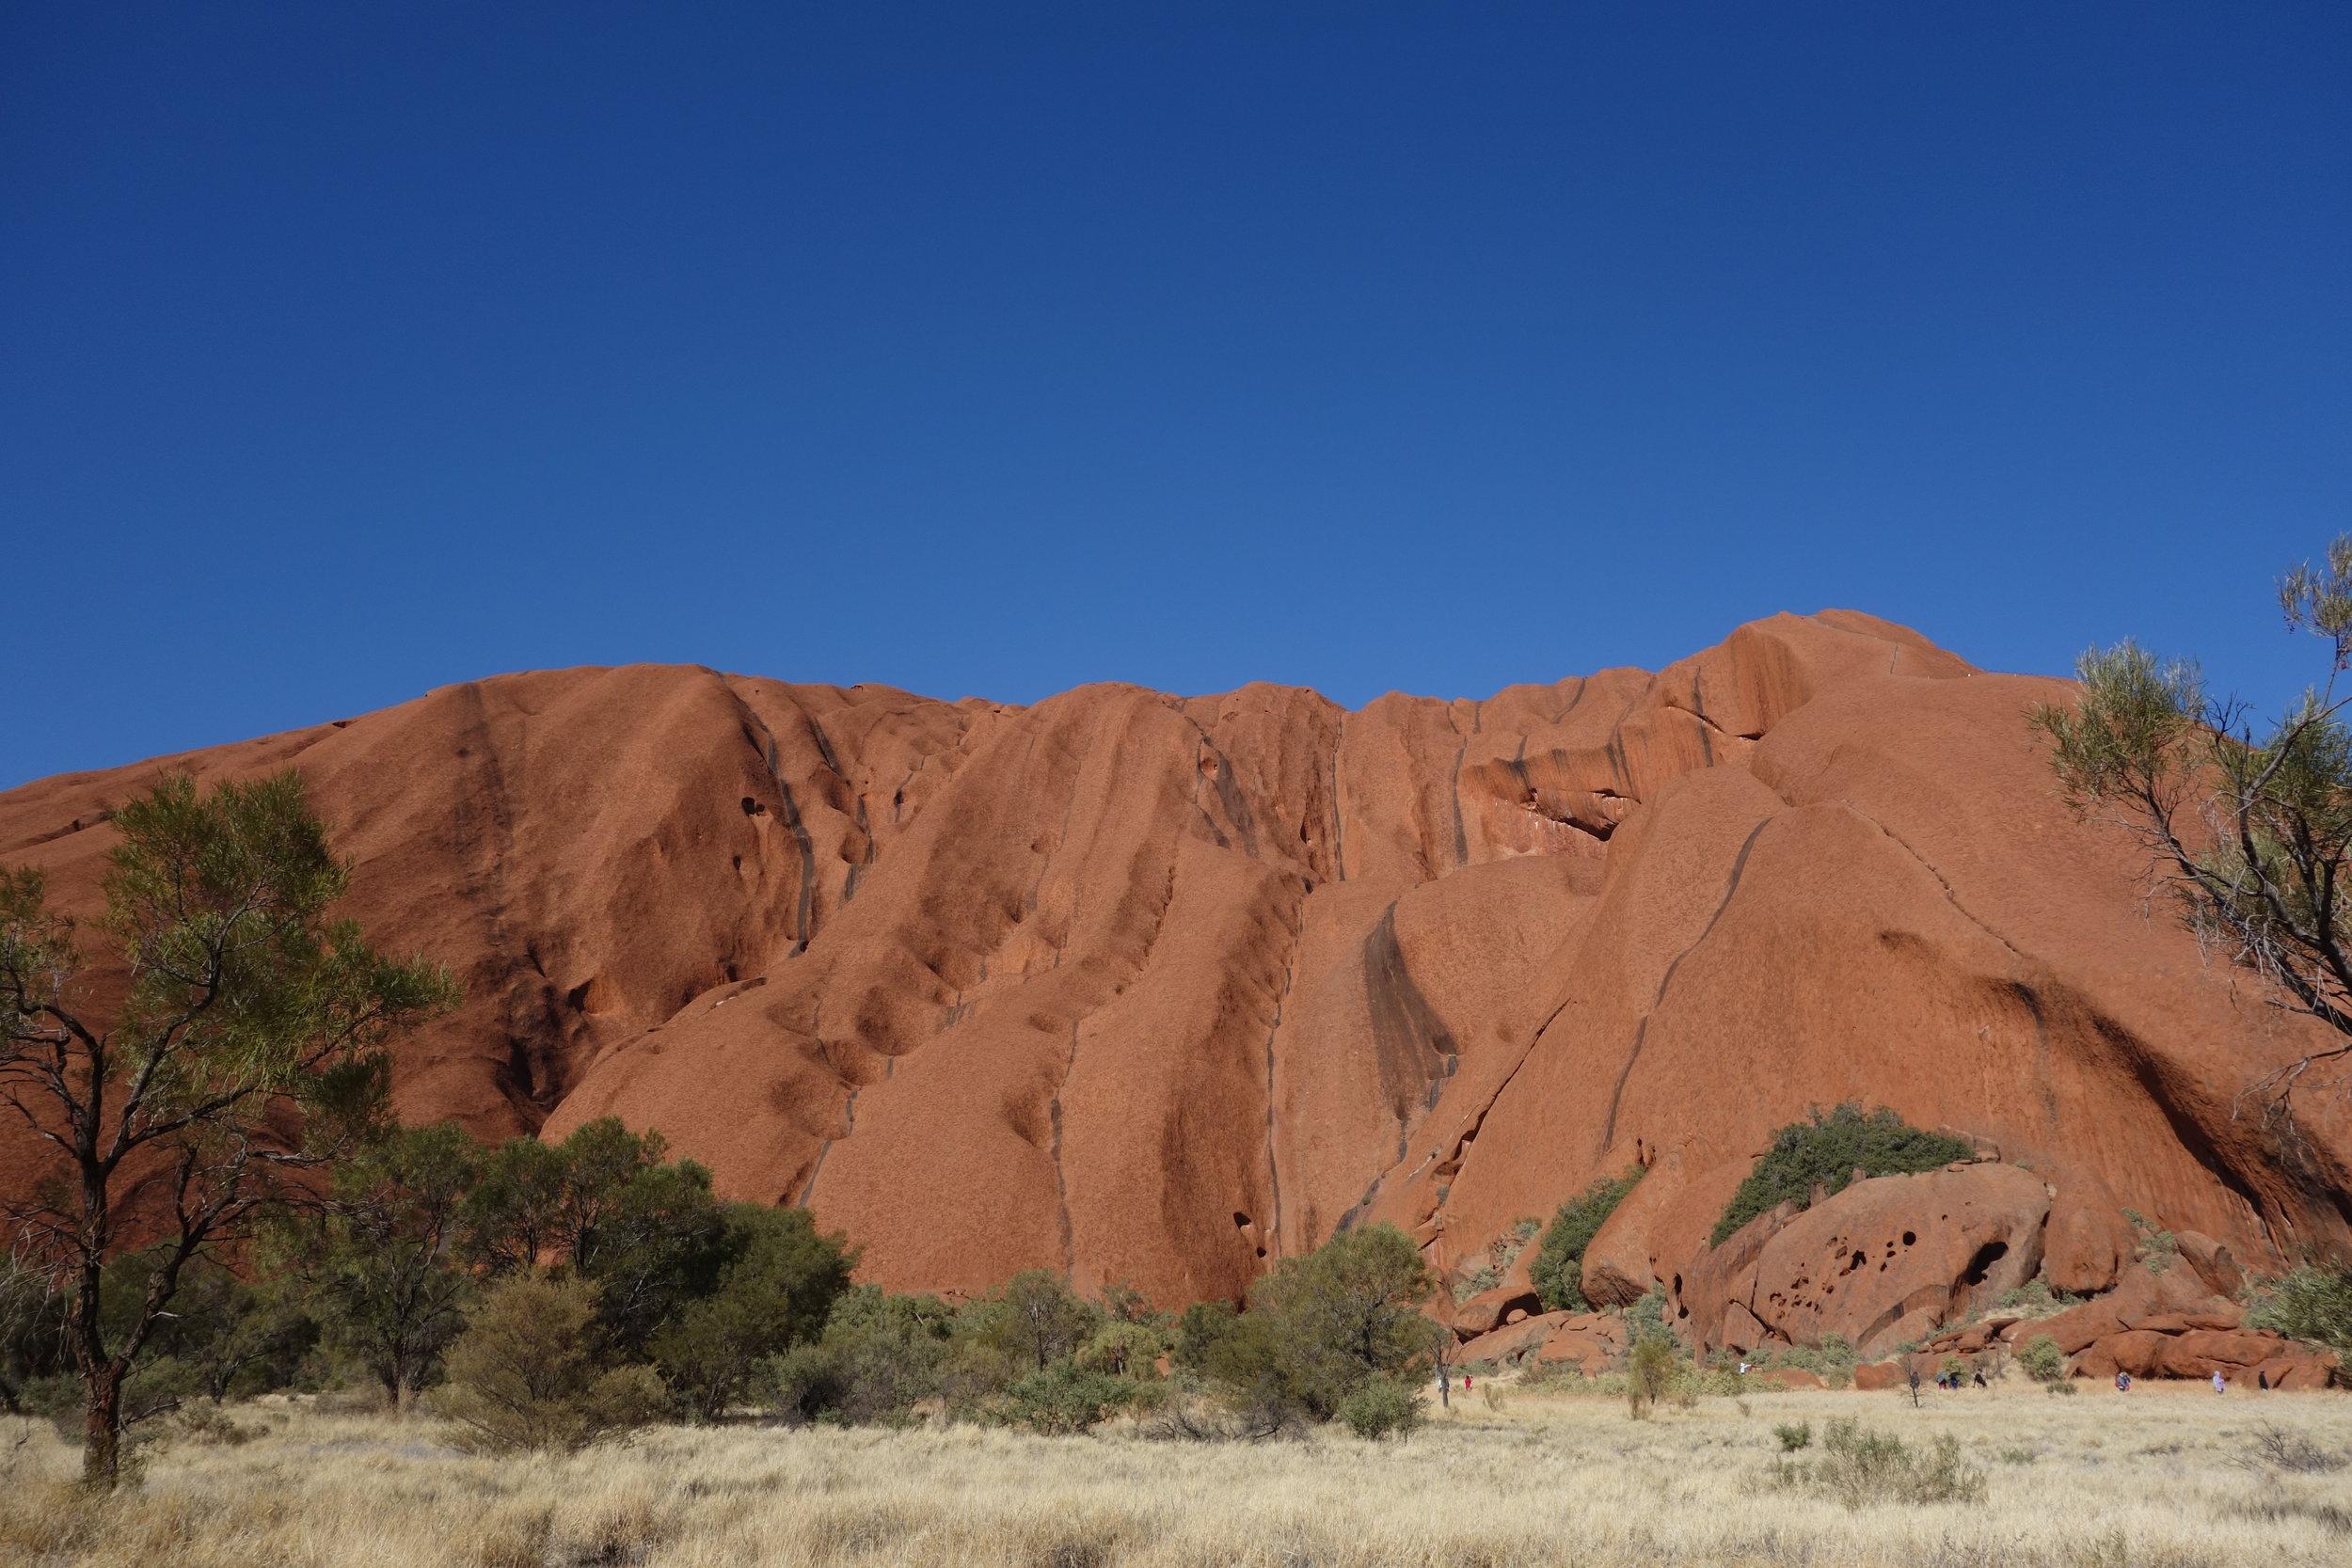 Uluru with beautiful dark streaks where the water has rushed down in the wet season